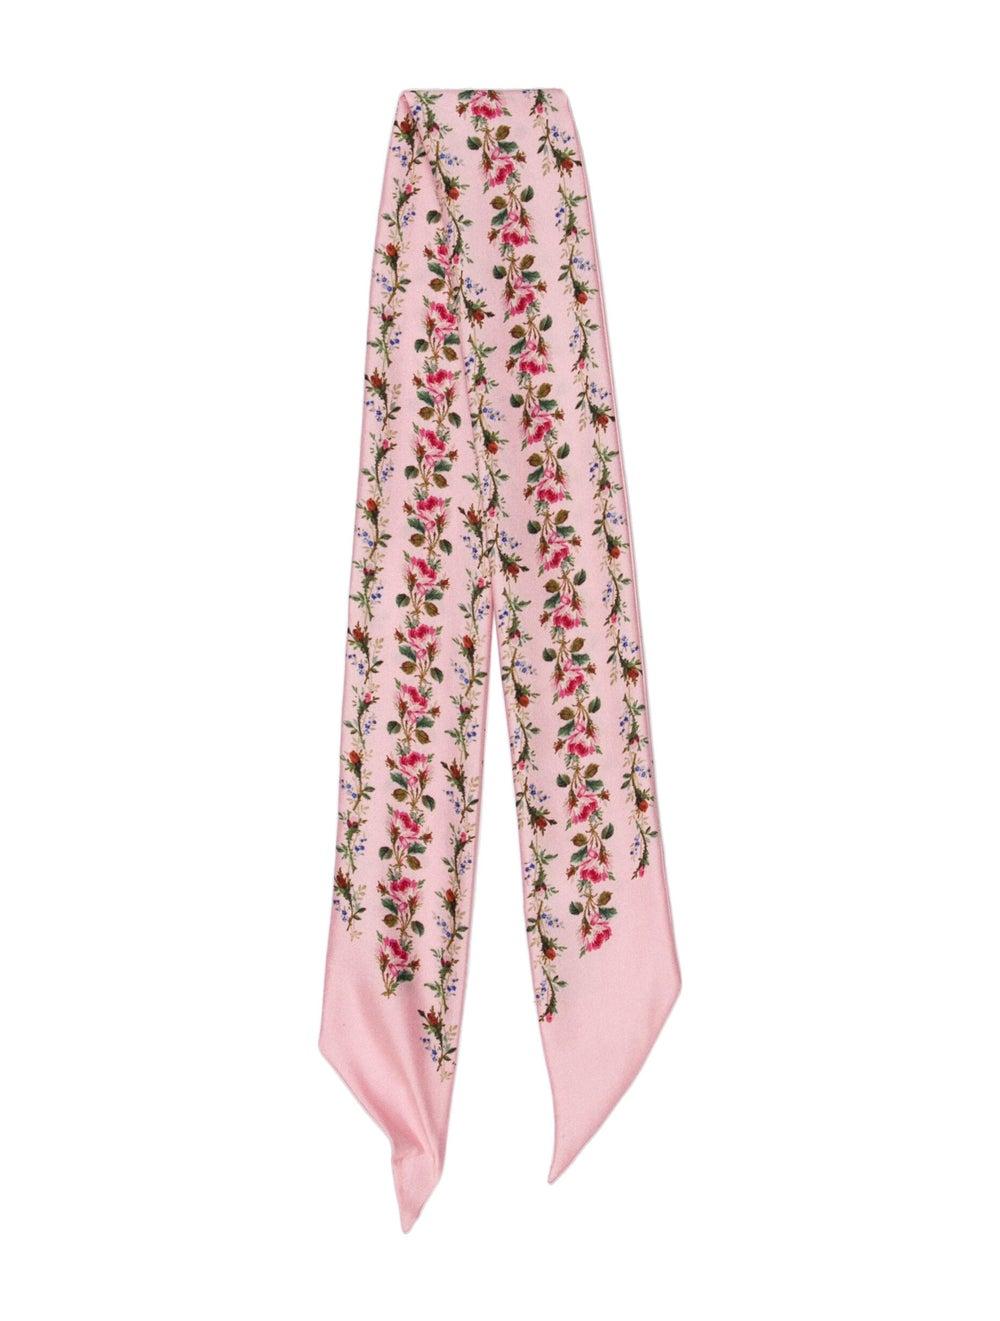 Gucci Silk Floral Print Bandeau Pink - image 1